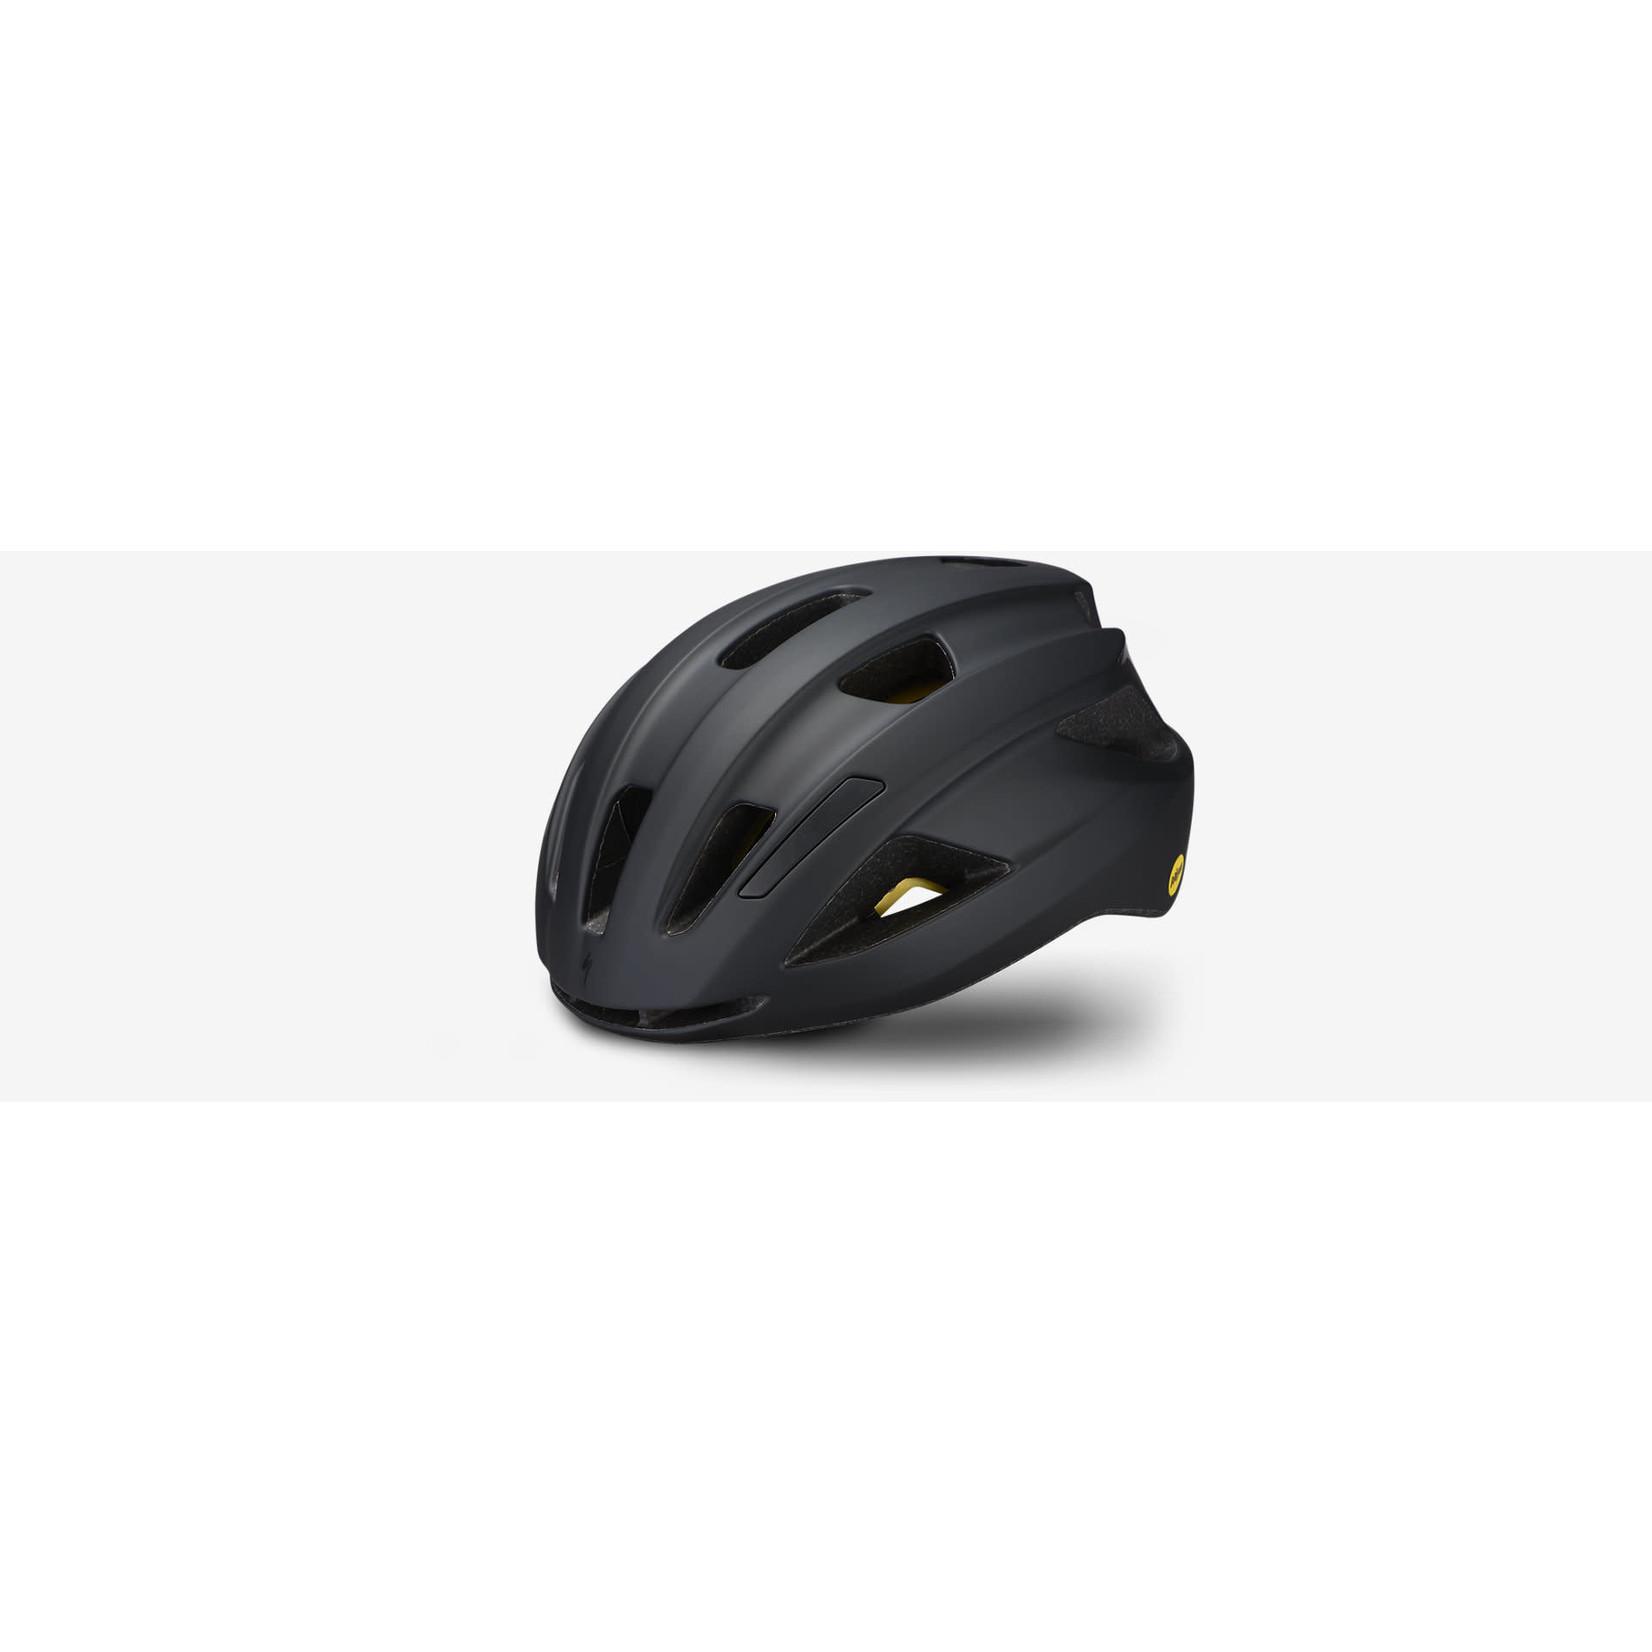 Specialized Specialized Align II Helmet, Black, S/M